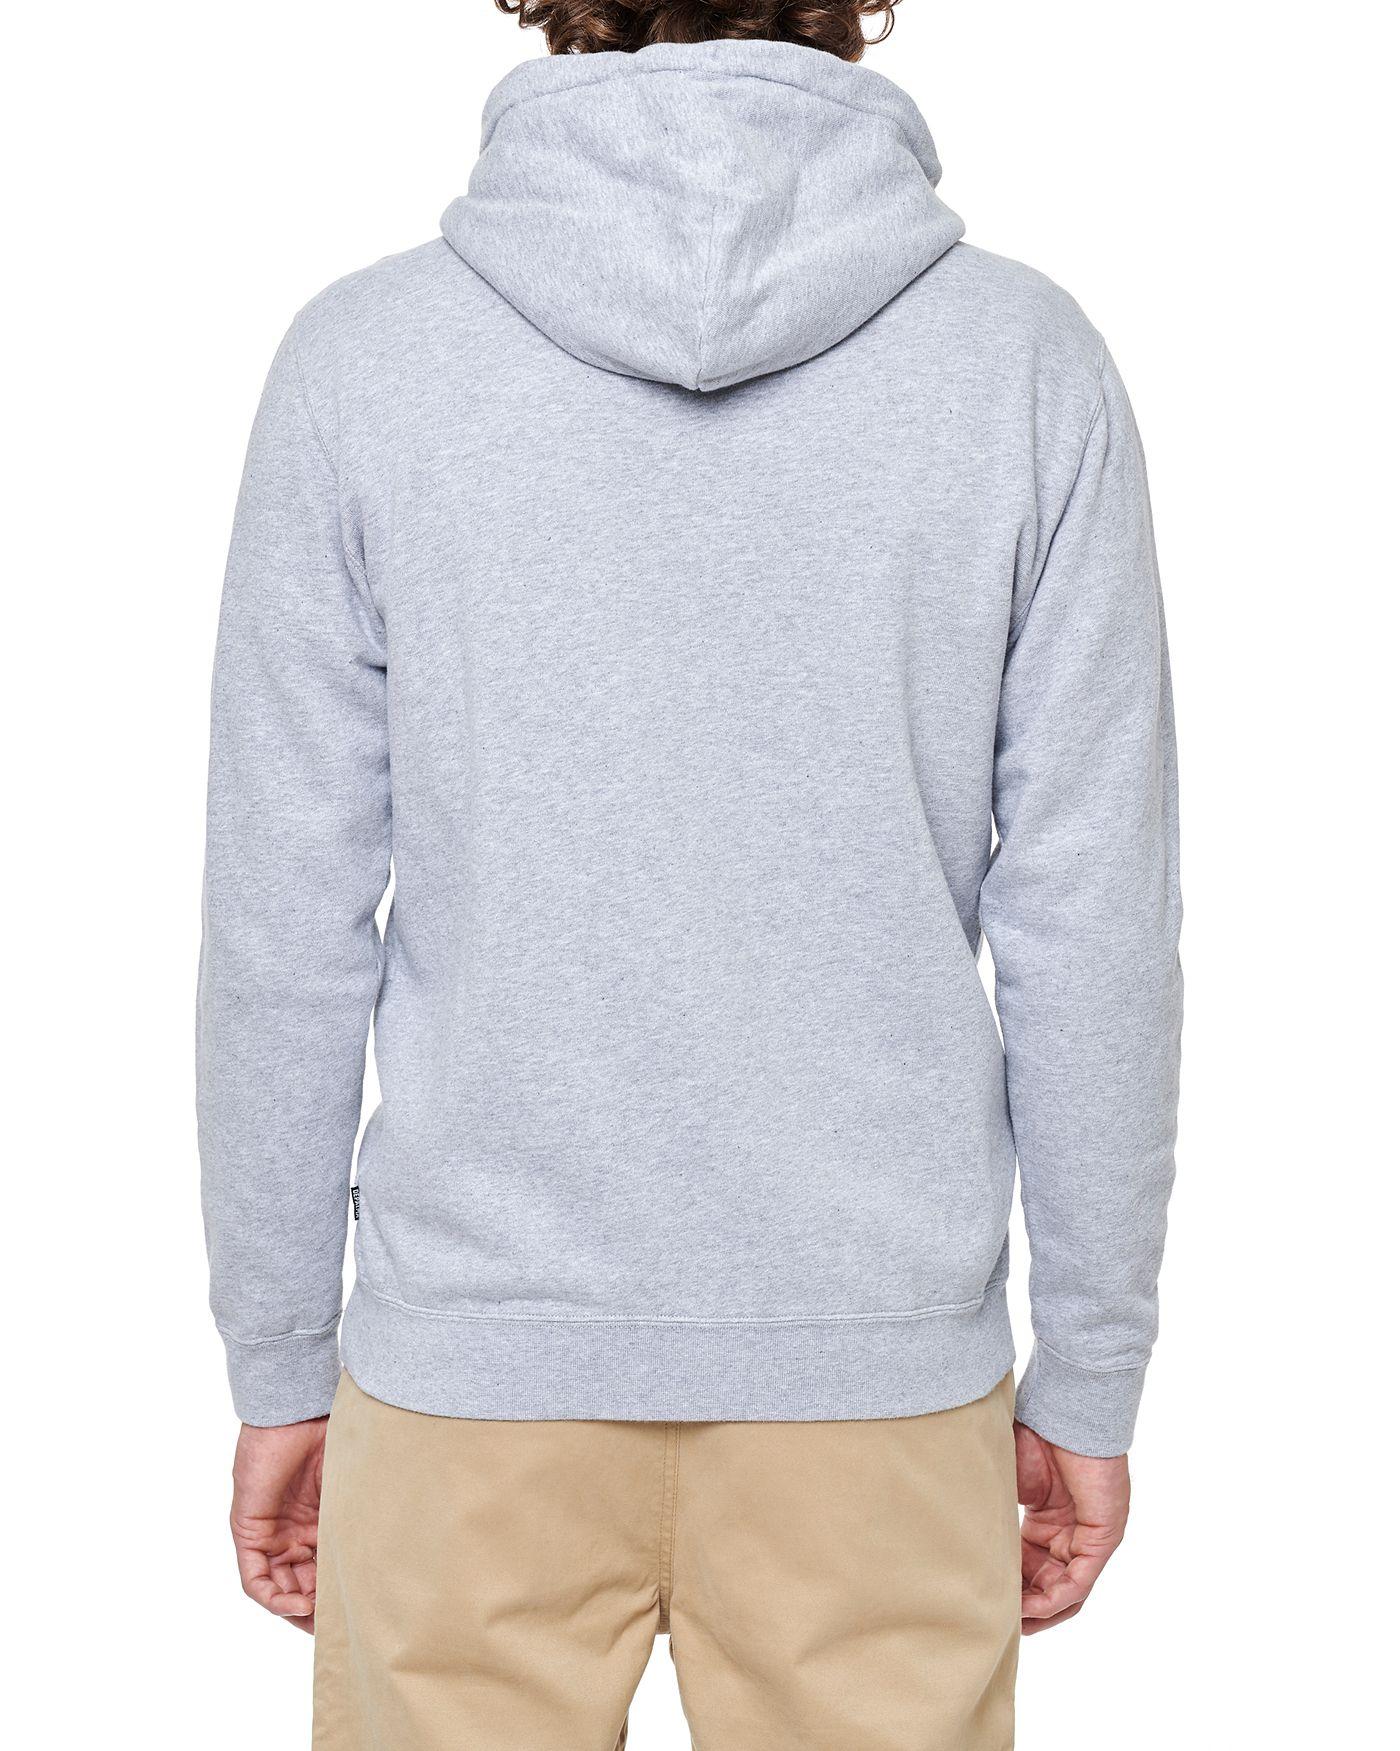 Photo of DPWW Zip Hooded Sweatshirt, Grey Melange